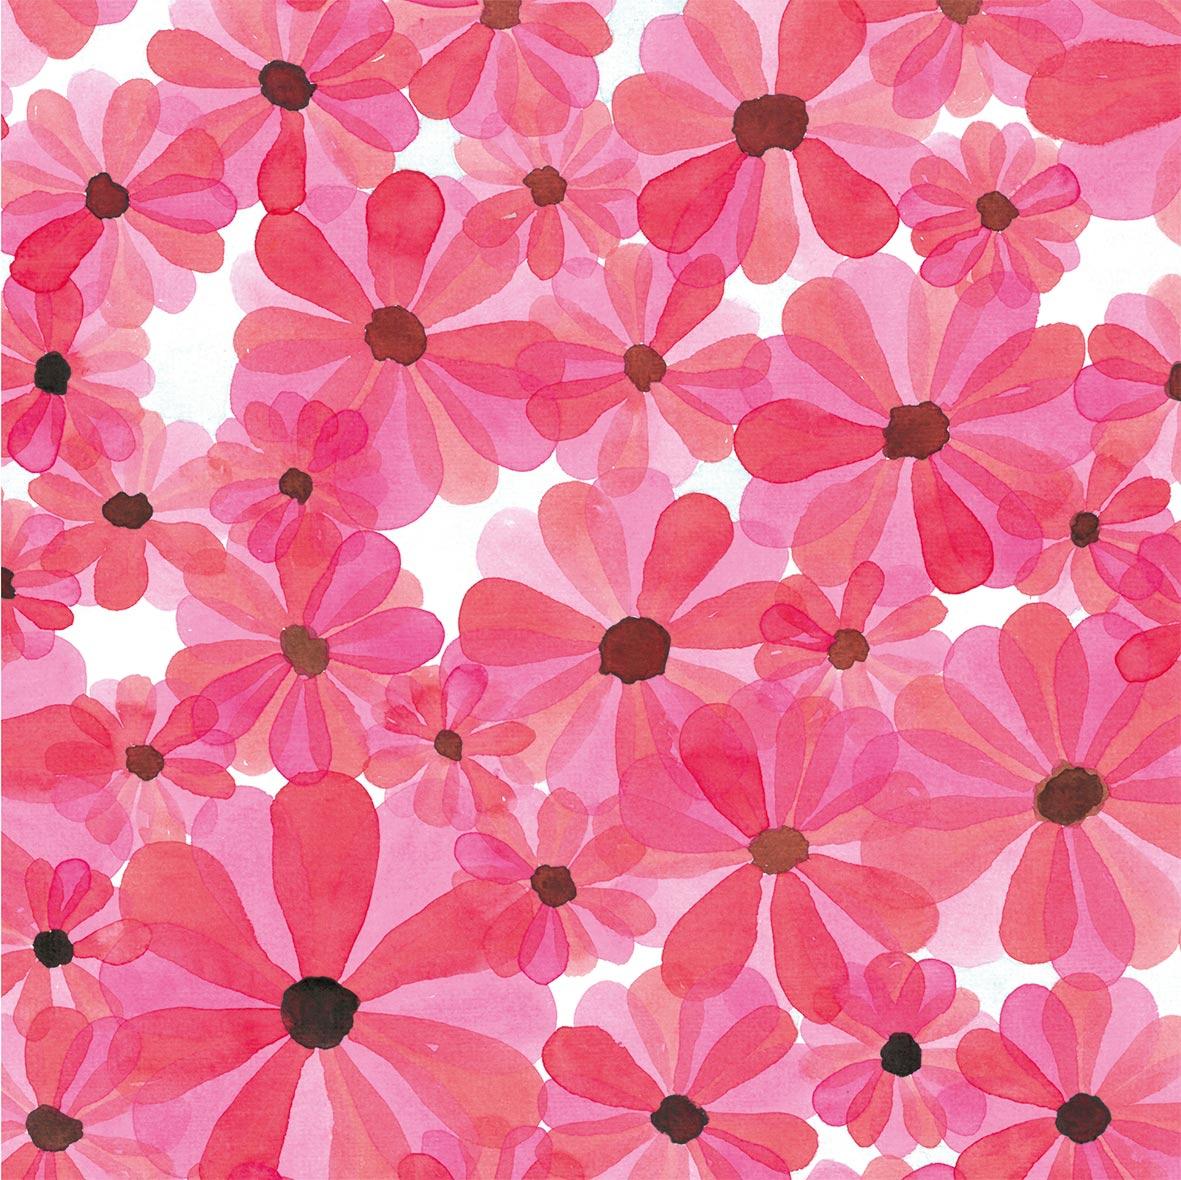 Pink Flush33x33 cm